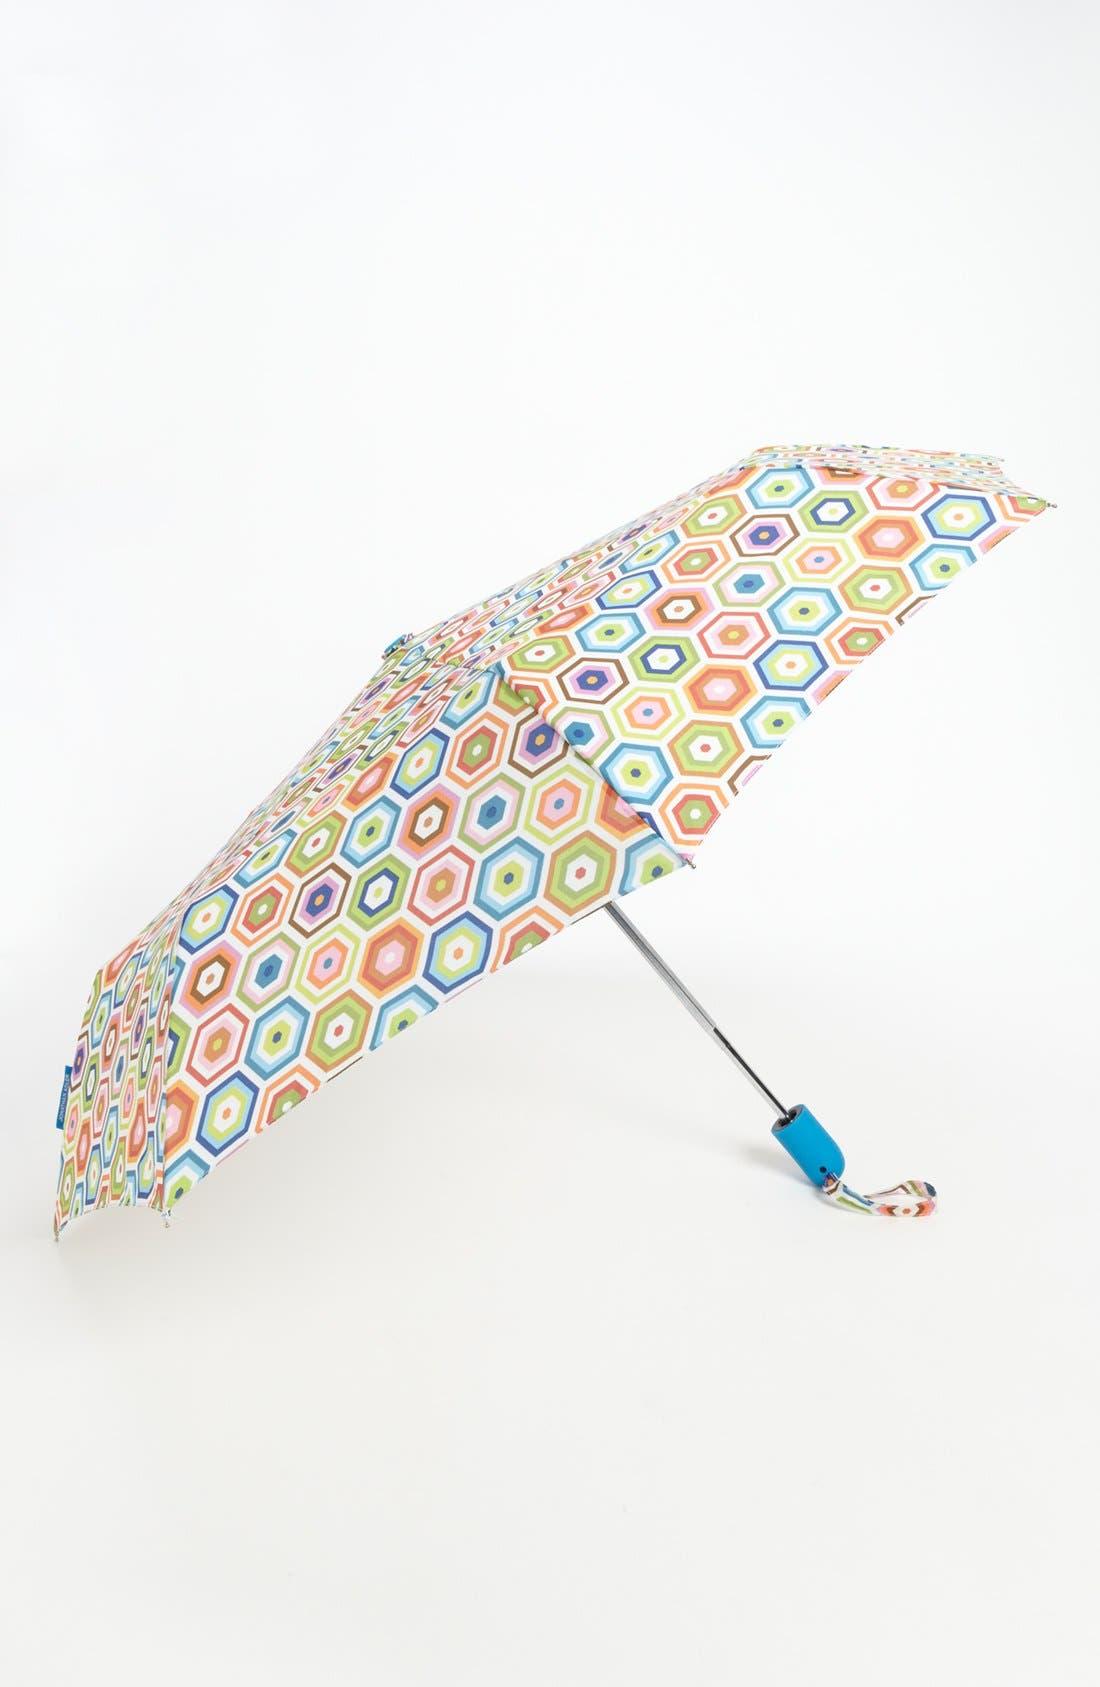 Alternate Image 1 Selected - Jonathan Adler 'Honeycomb' Umbrella